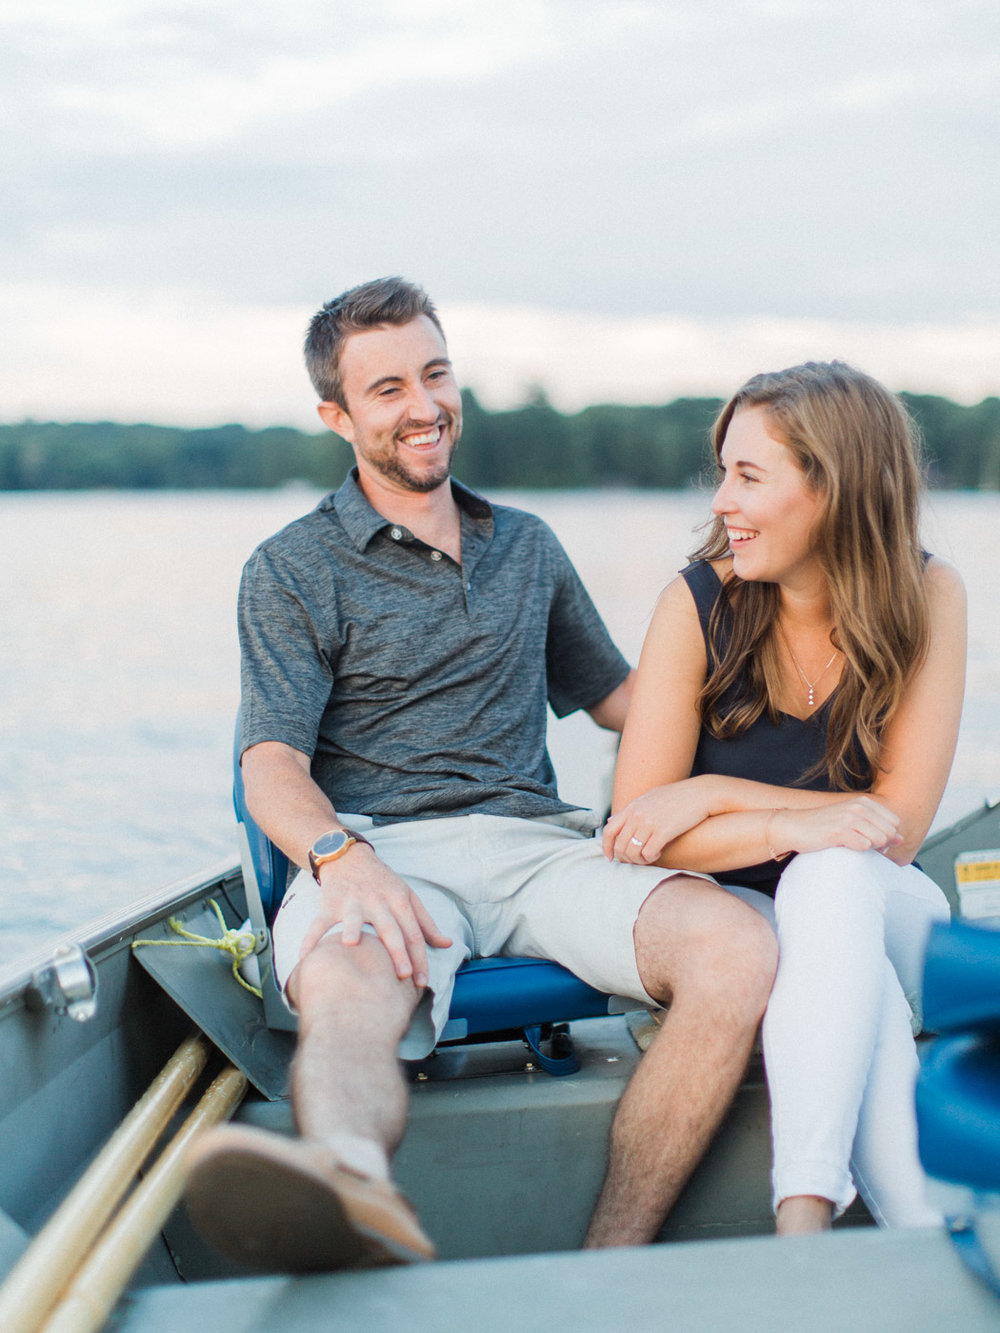 muskoka-wedding-photographer-adventurous-couples-engagement-session-lake-89.jpg